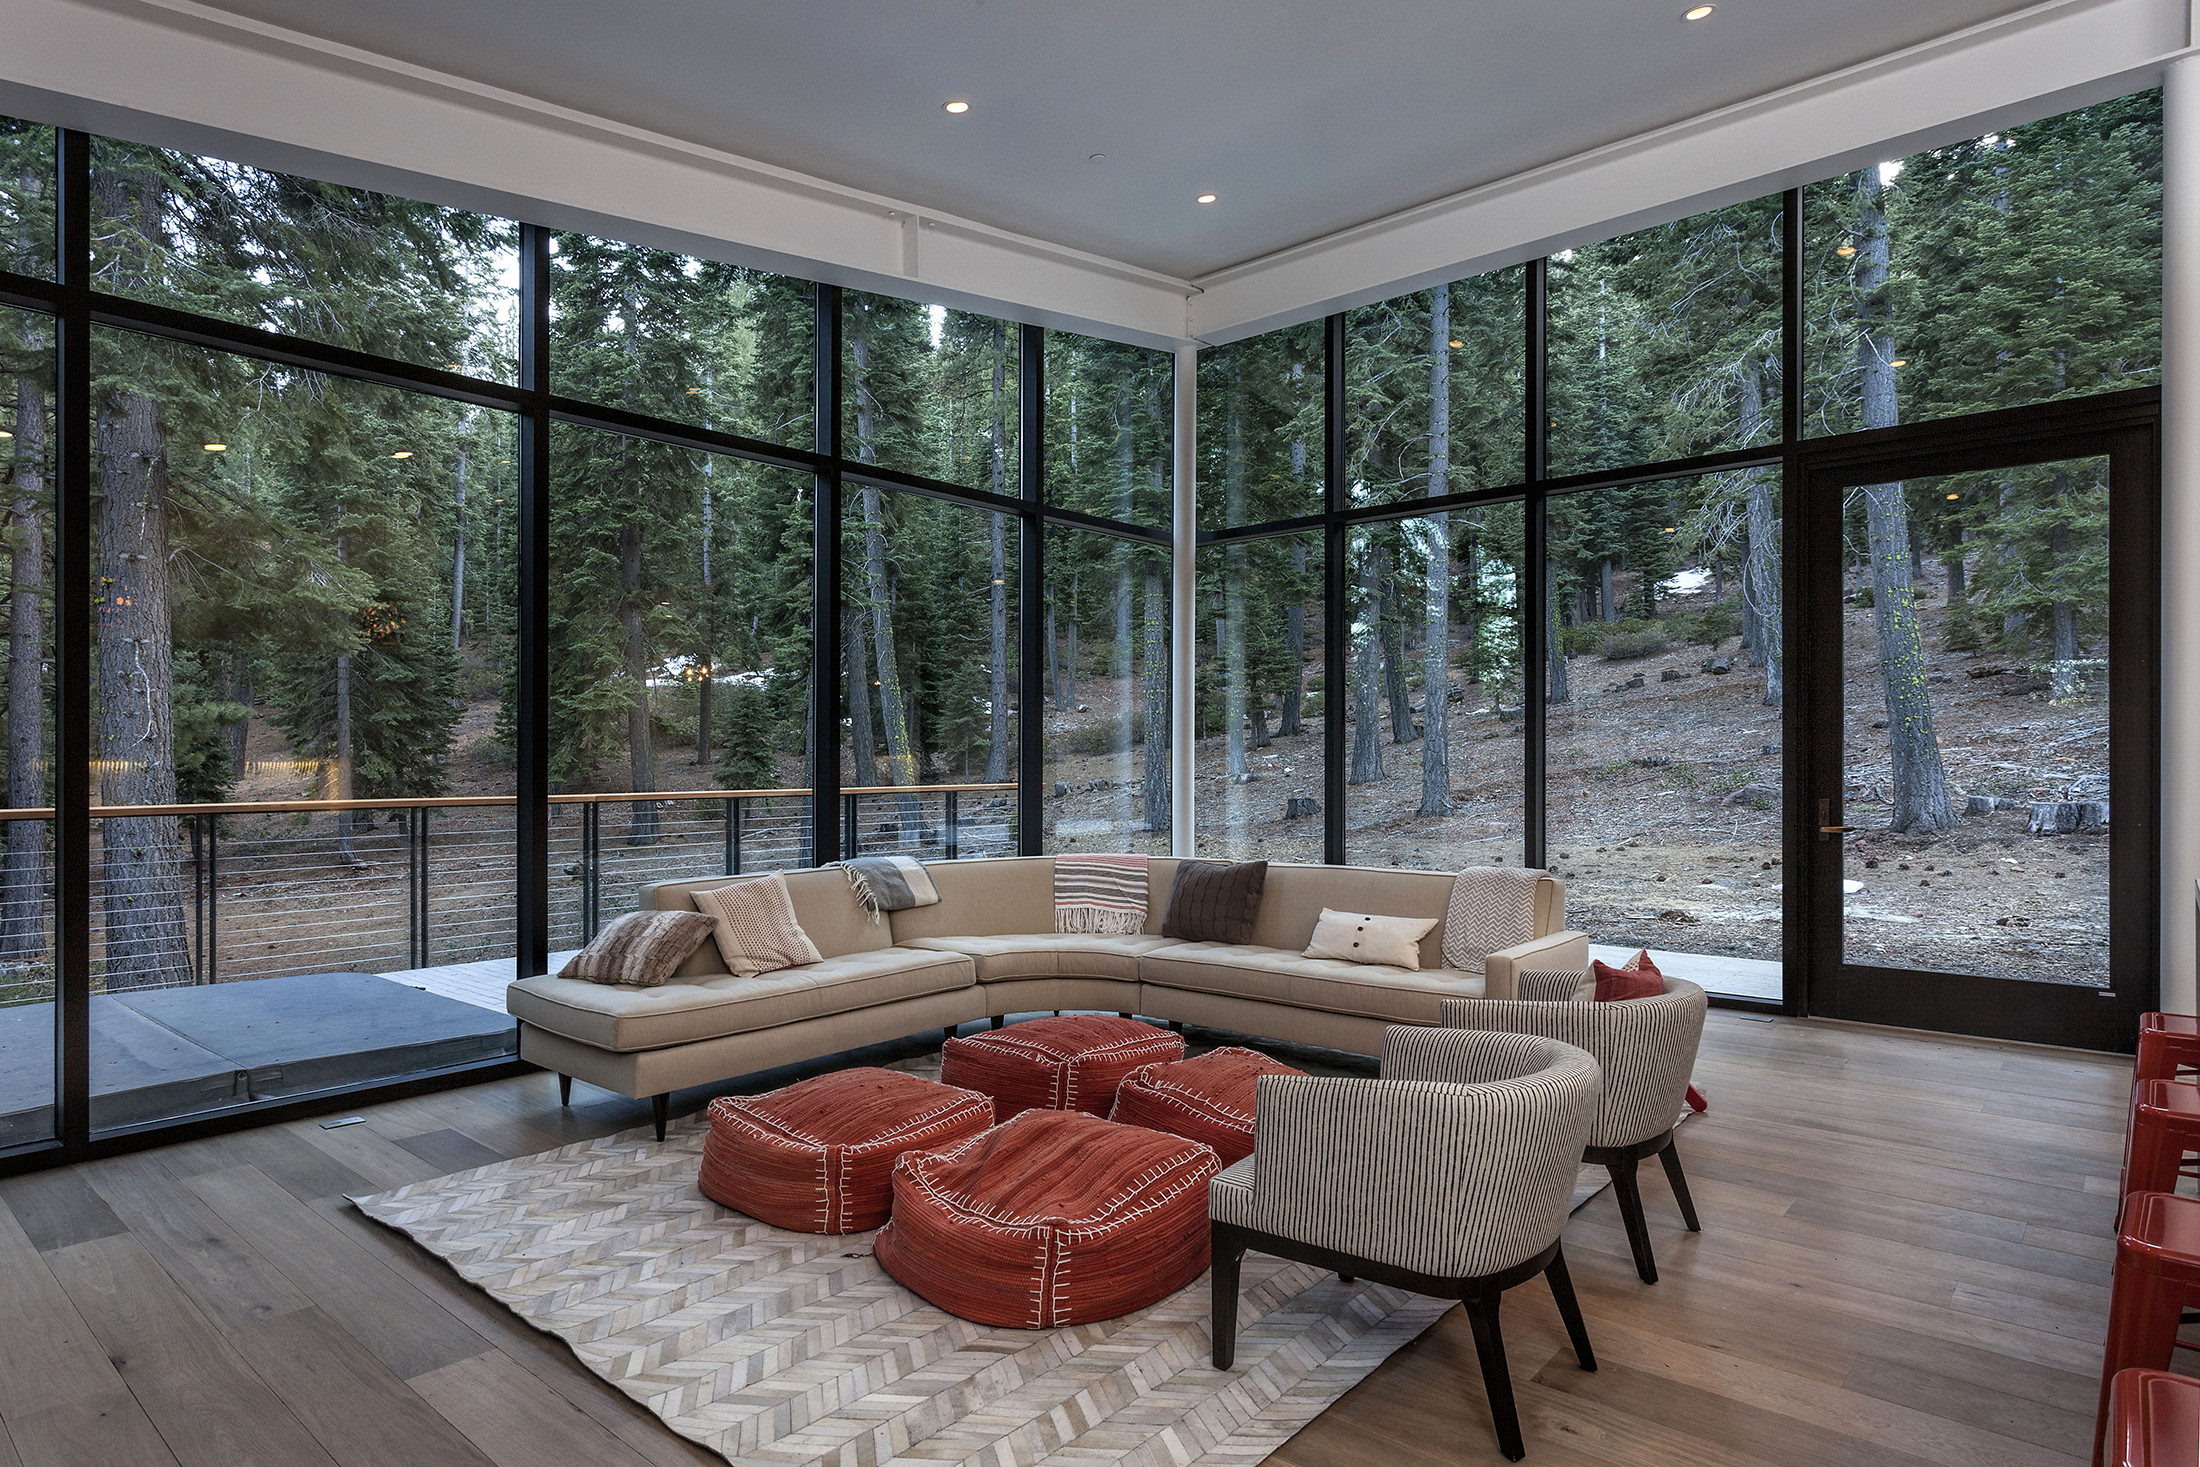 Living room with view home interior design ©brick-inc